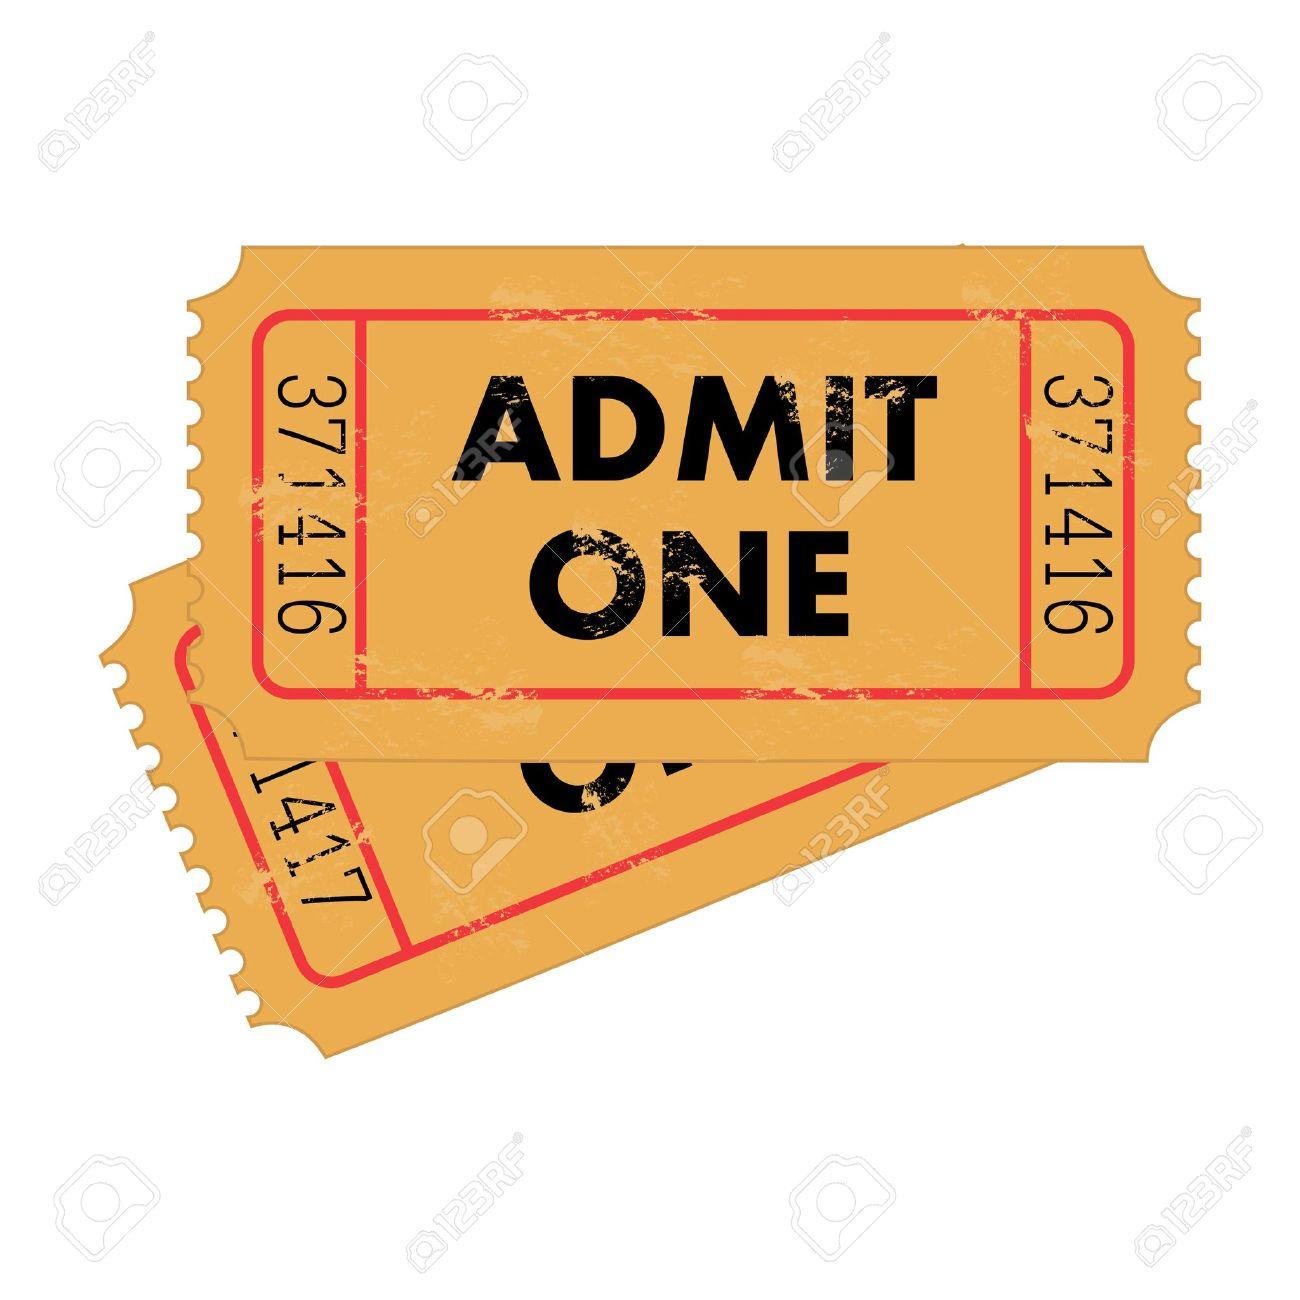 Movie Ticket Stub Stock Photos Images. Royalty Free Movie Ticket ...